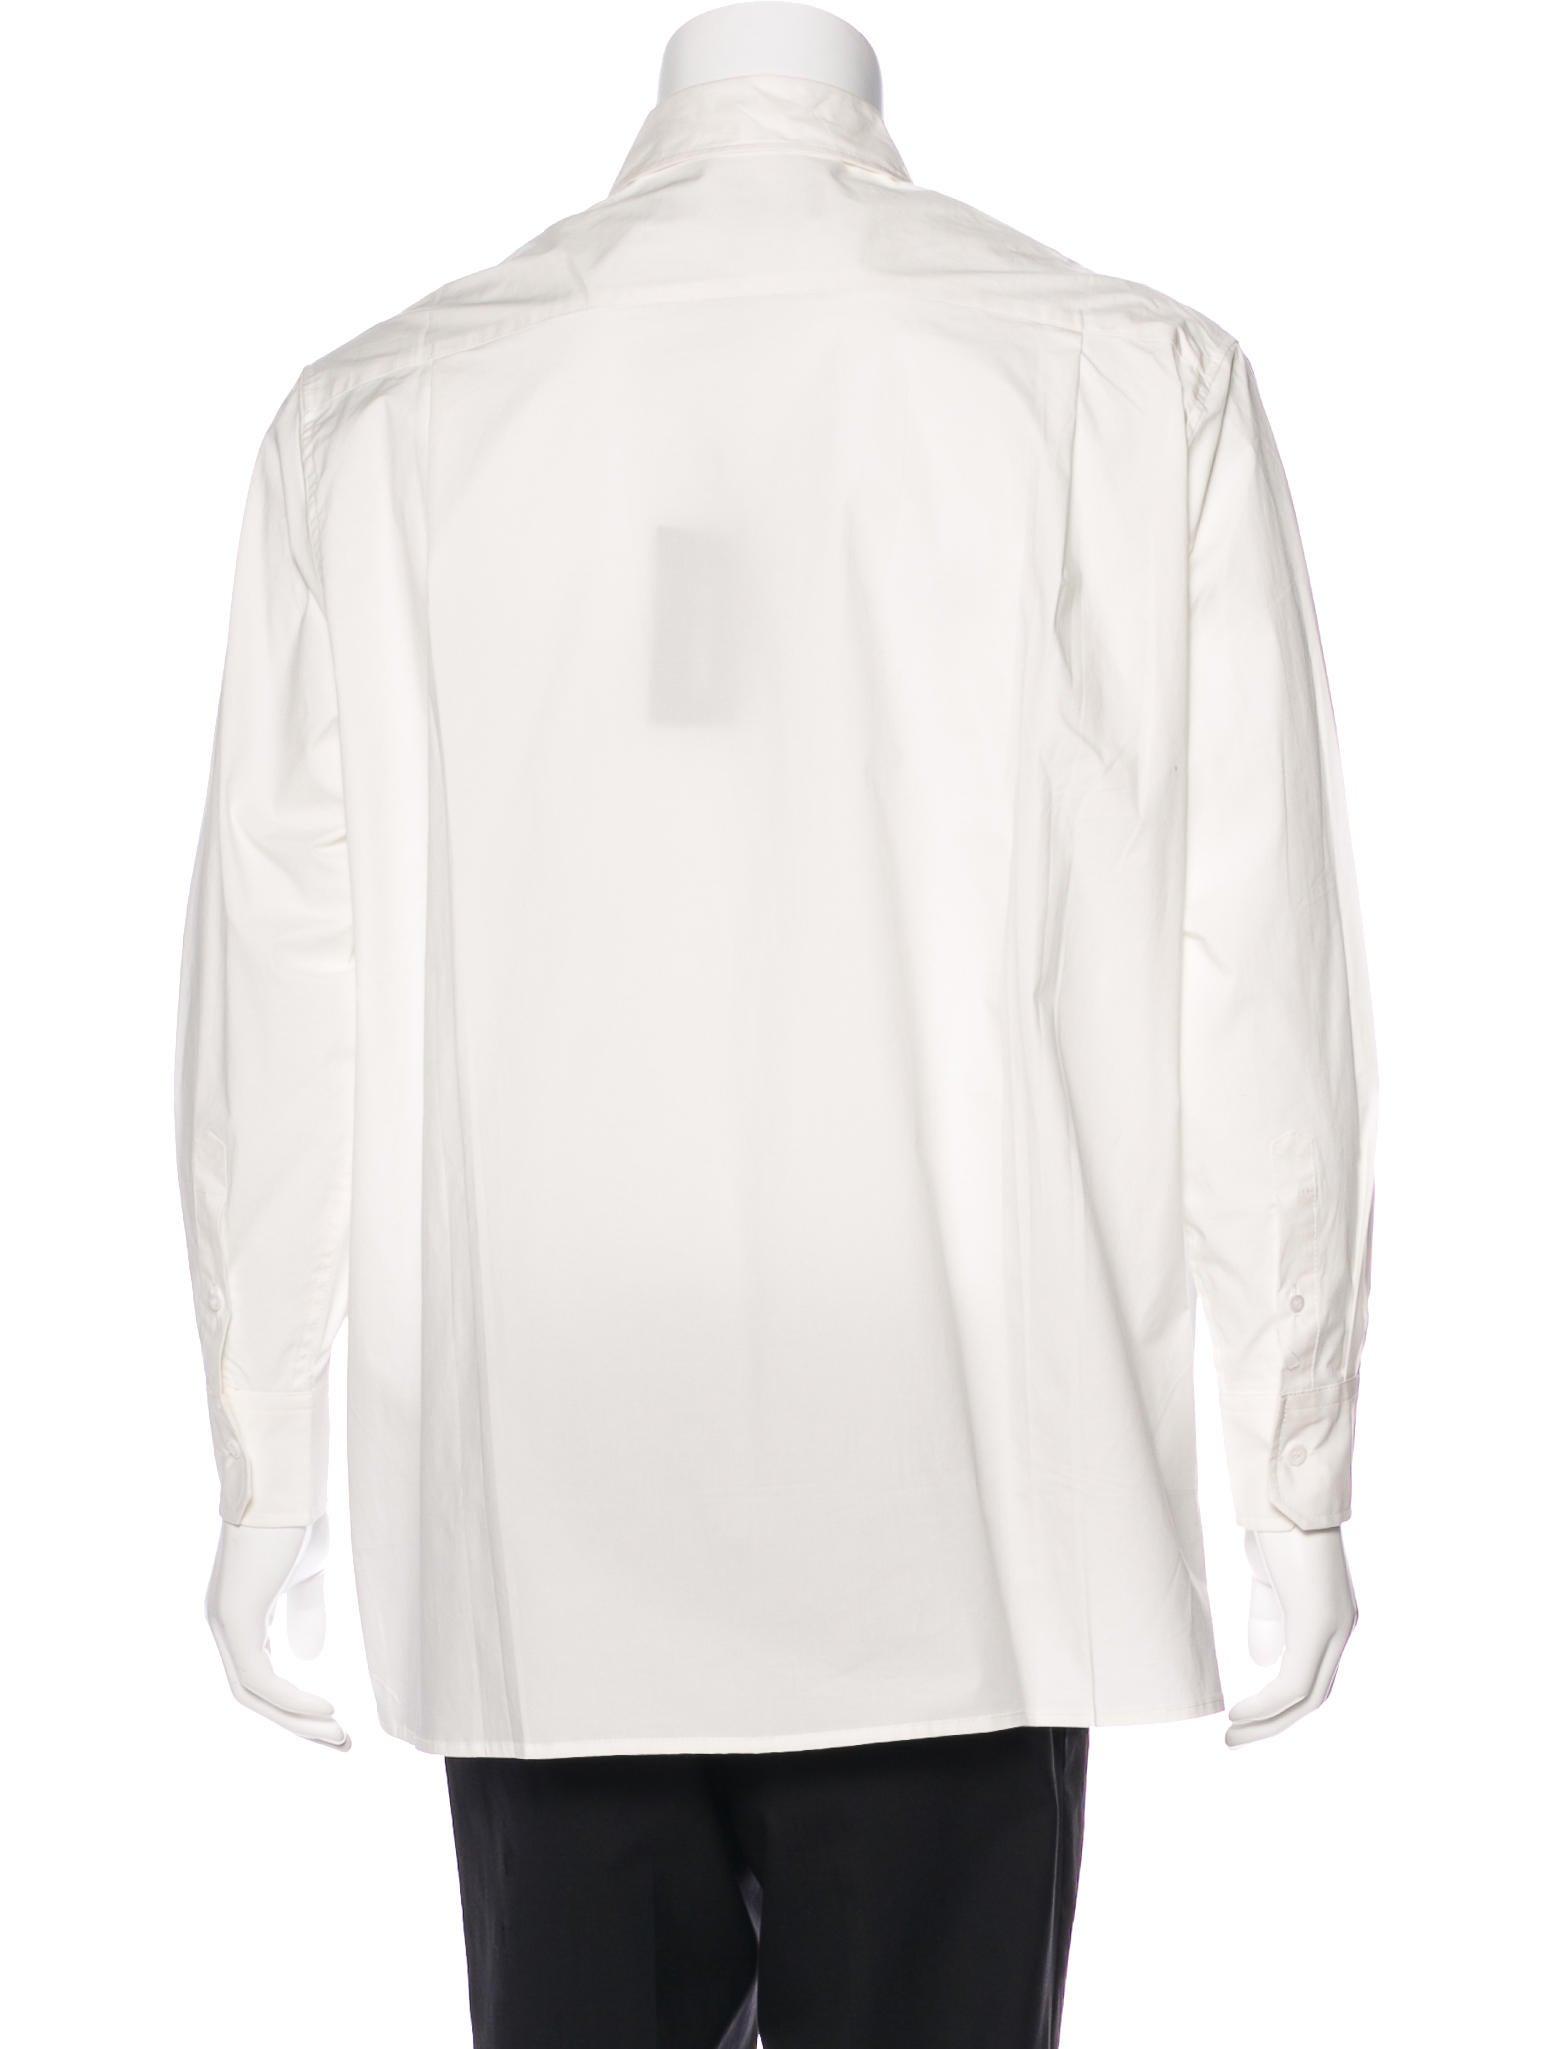 Raf simons x robert mapplethorpe 2017 untitled 1972 shirt for Raf simons robert mapplethorpe shirt